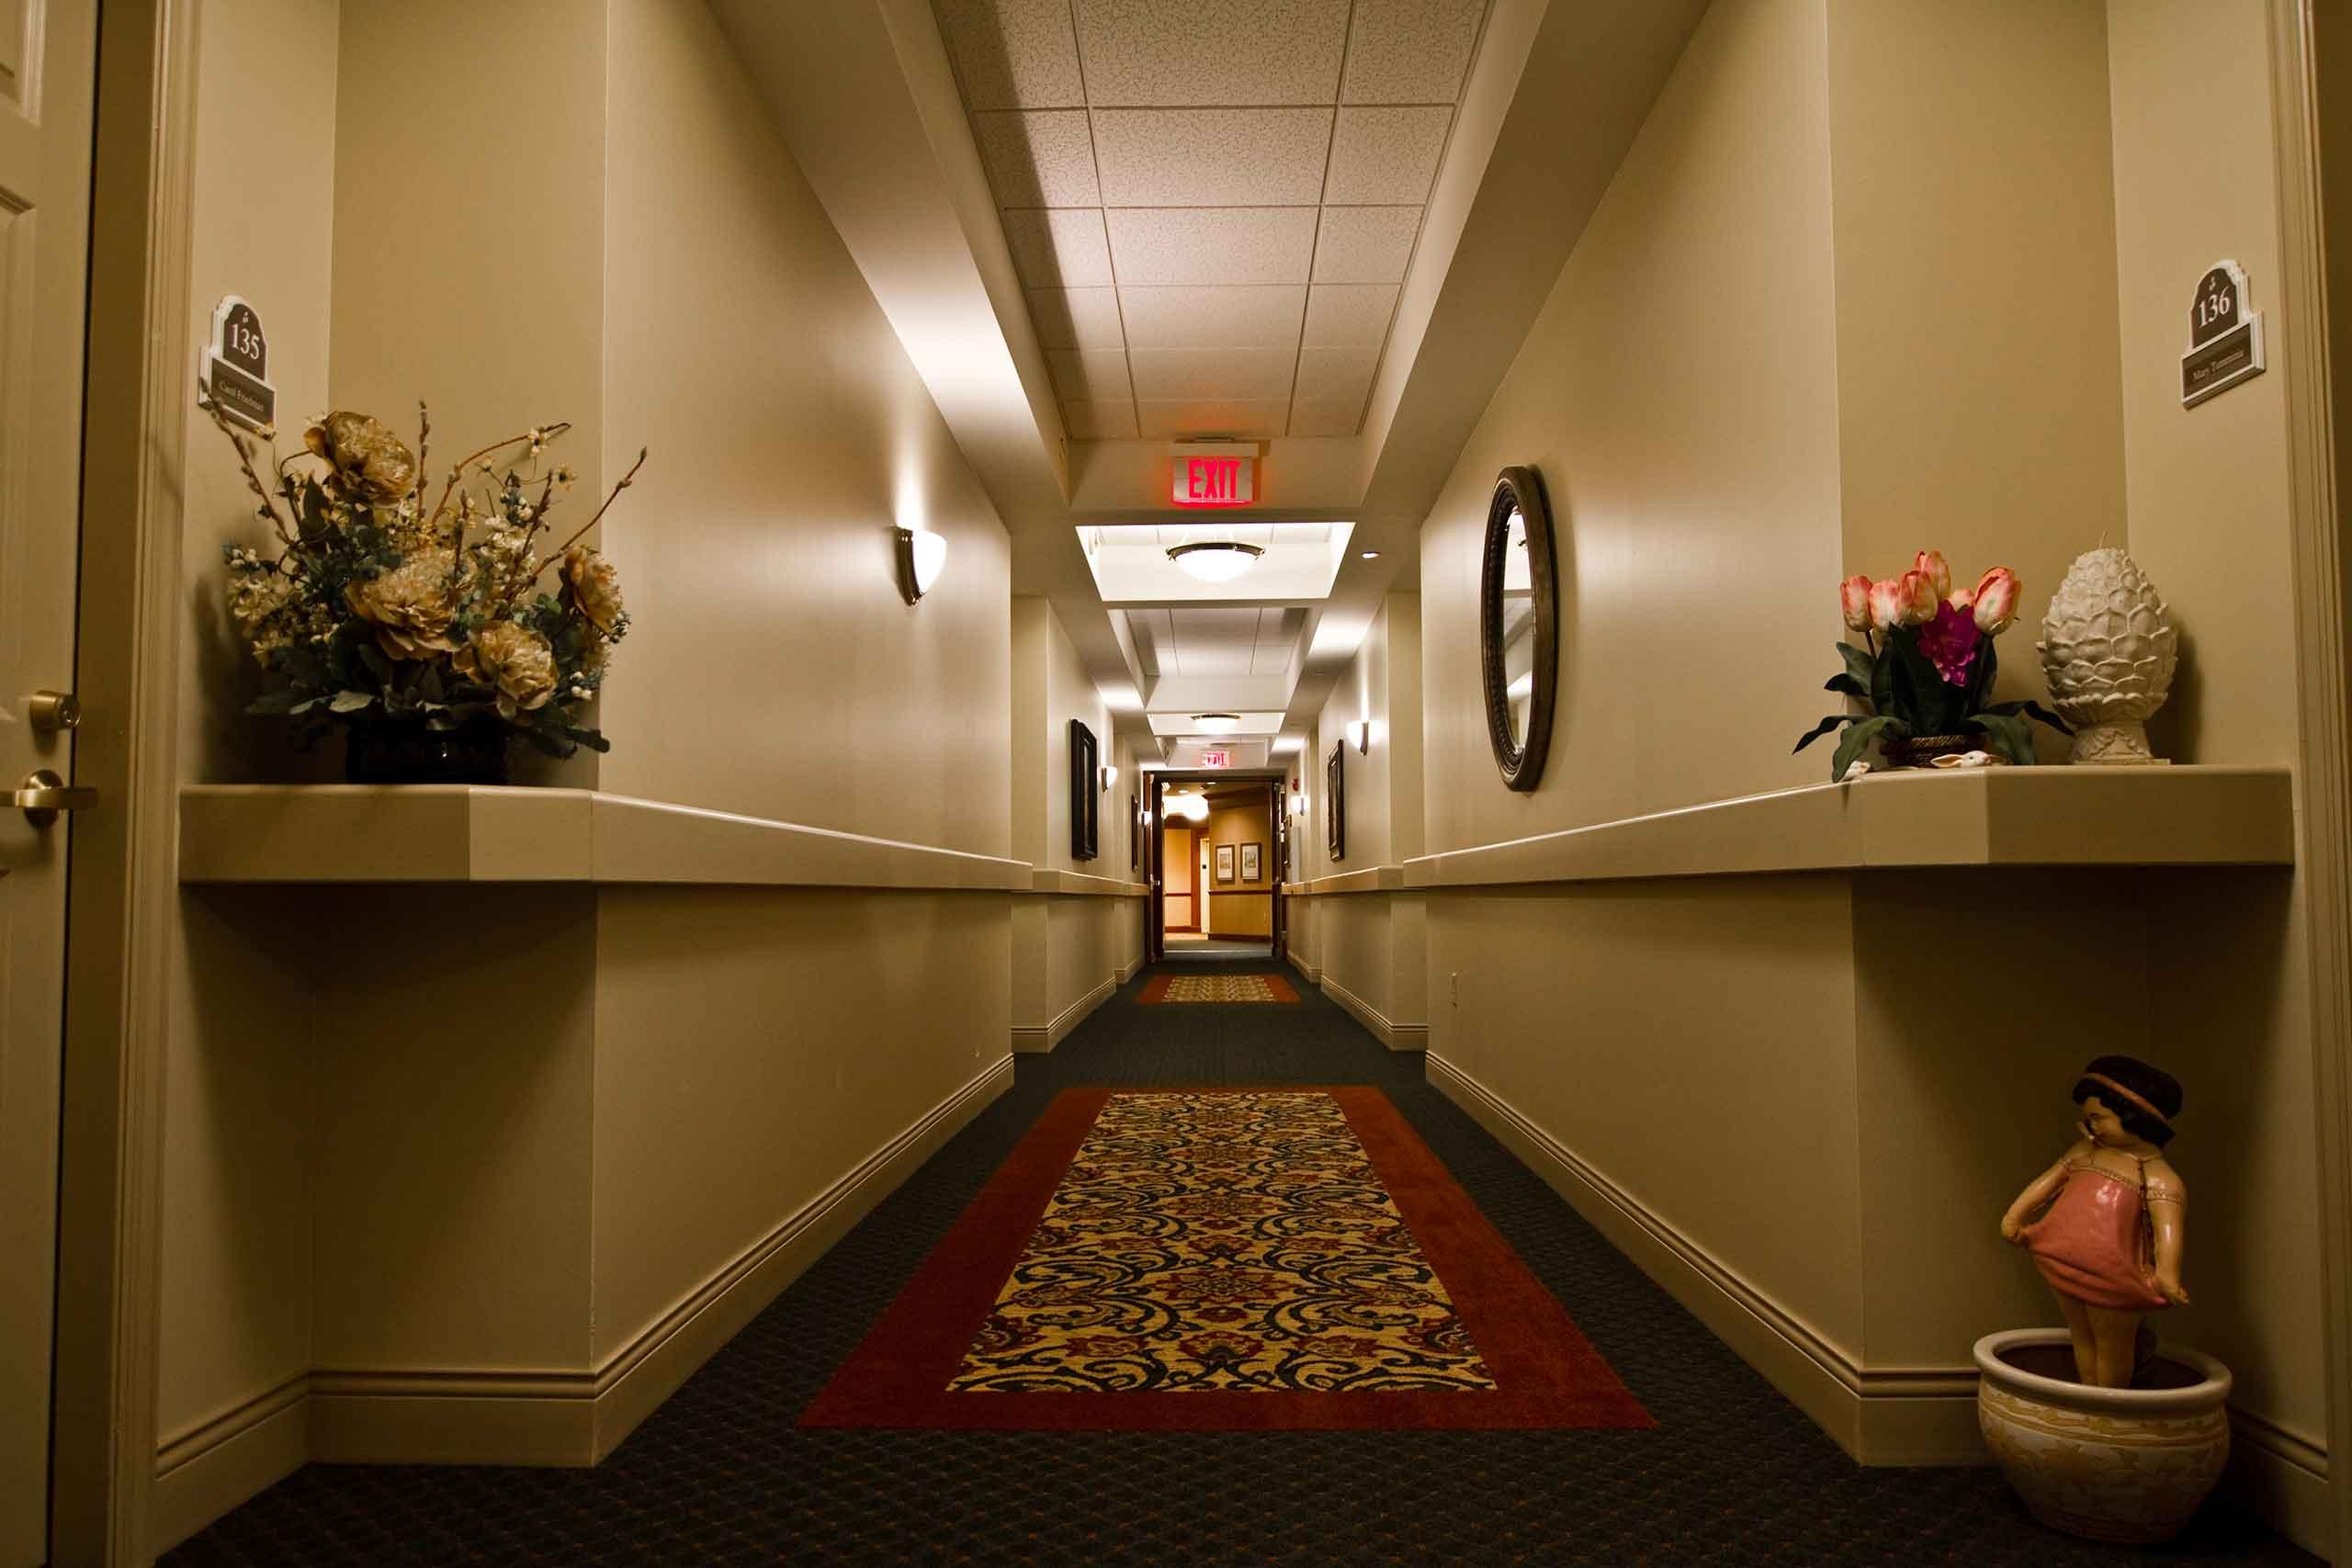 The-Hallmark-of-Creve-Coeur-Hallway